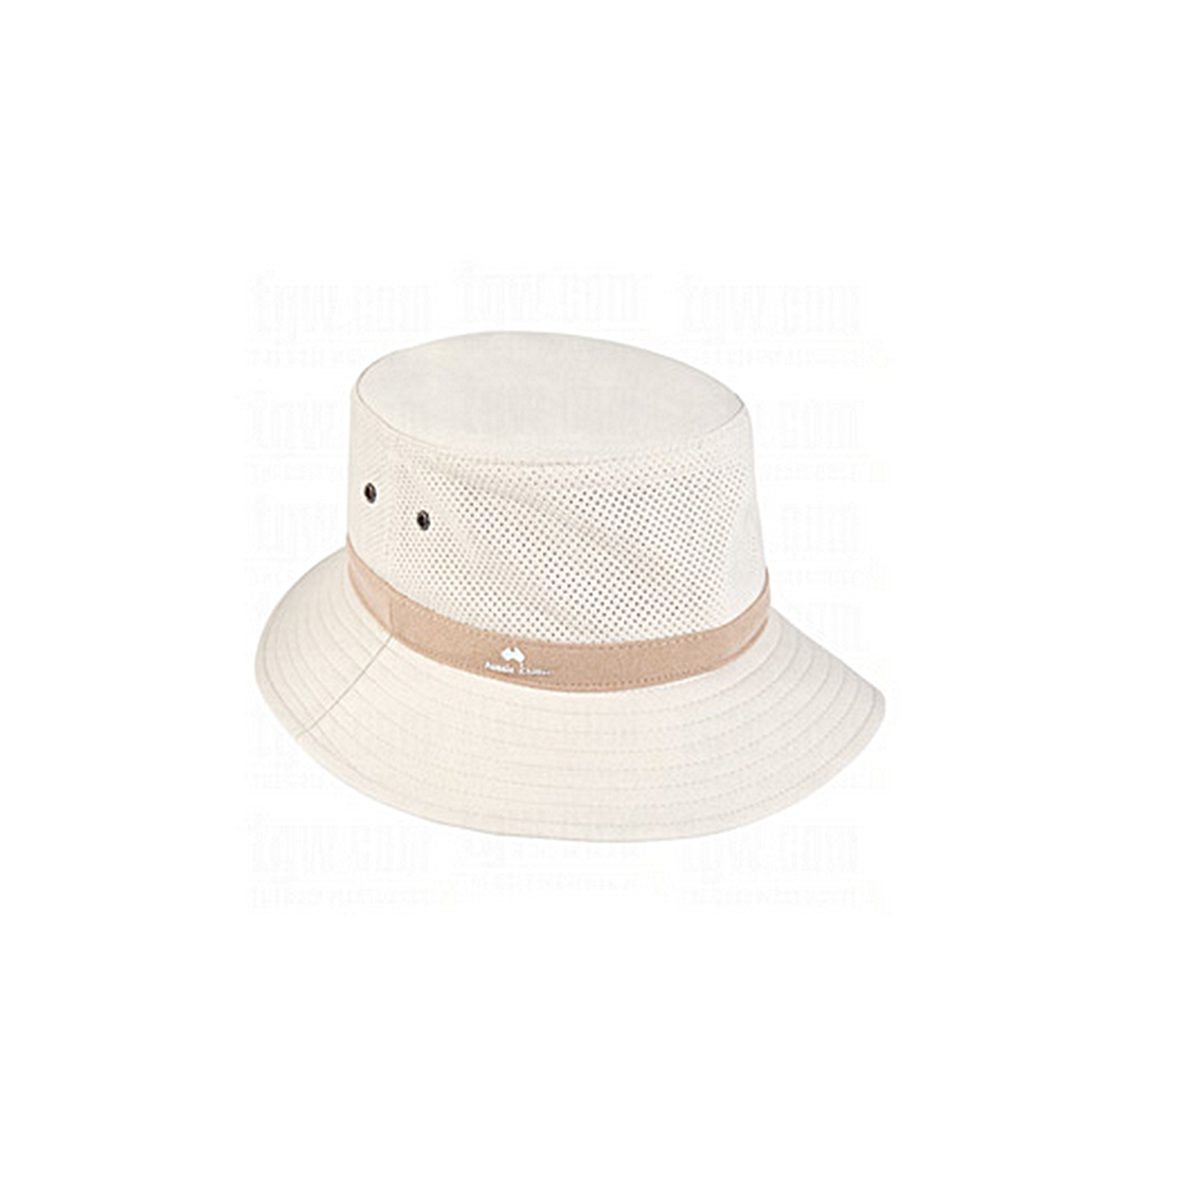 a7737e27d0b Chiller Bucket Perforated Hat- Pearl White by Aussie  Aussie Golf ...